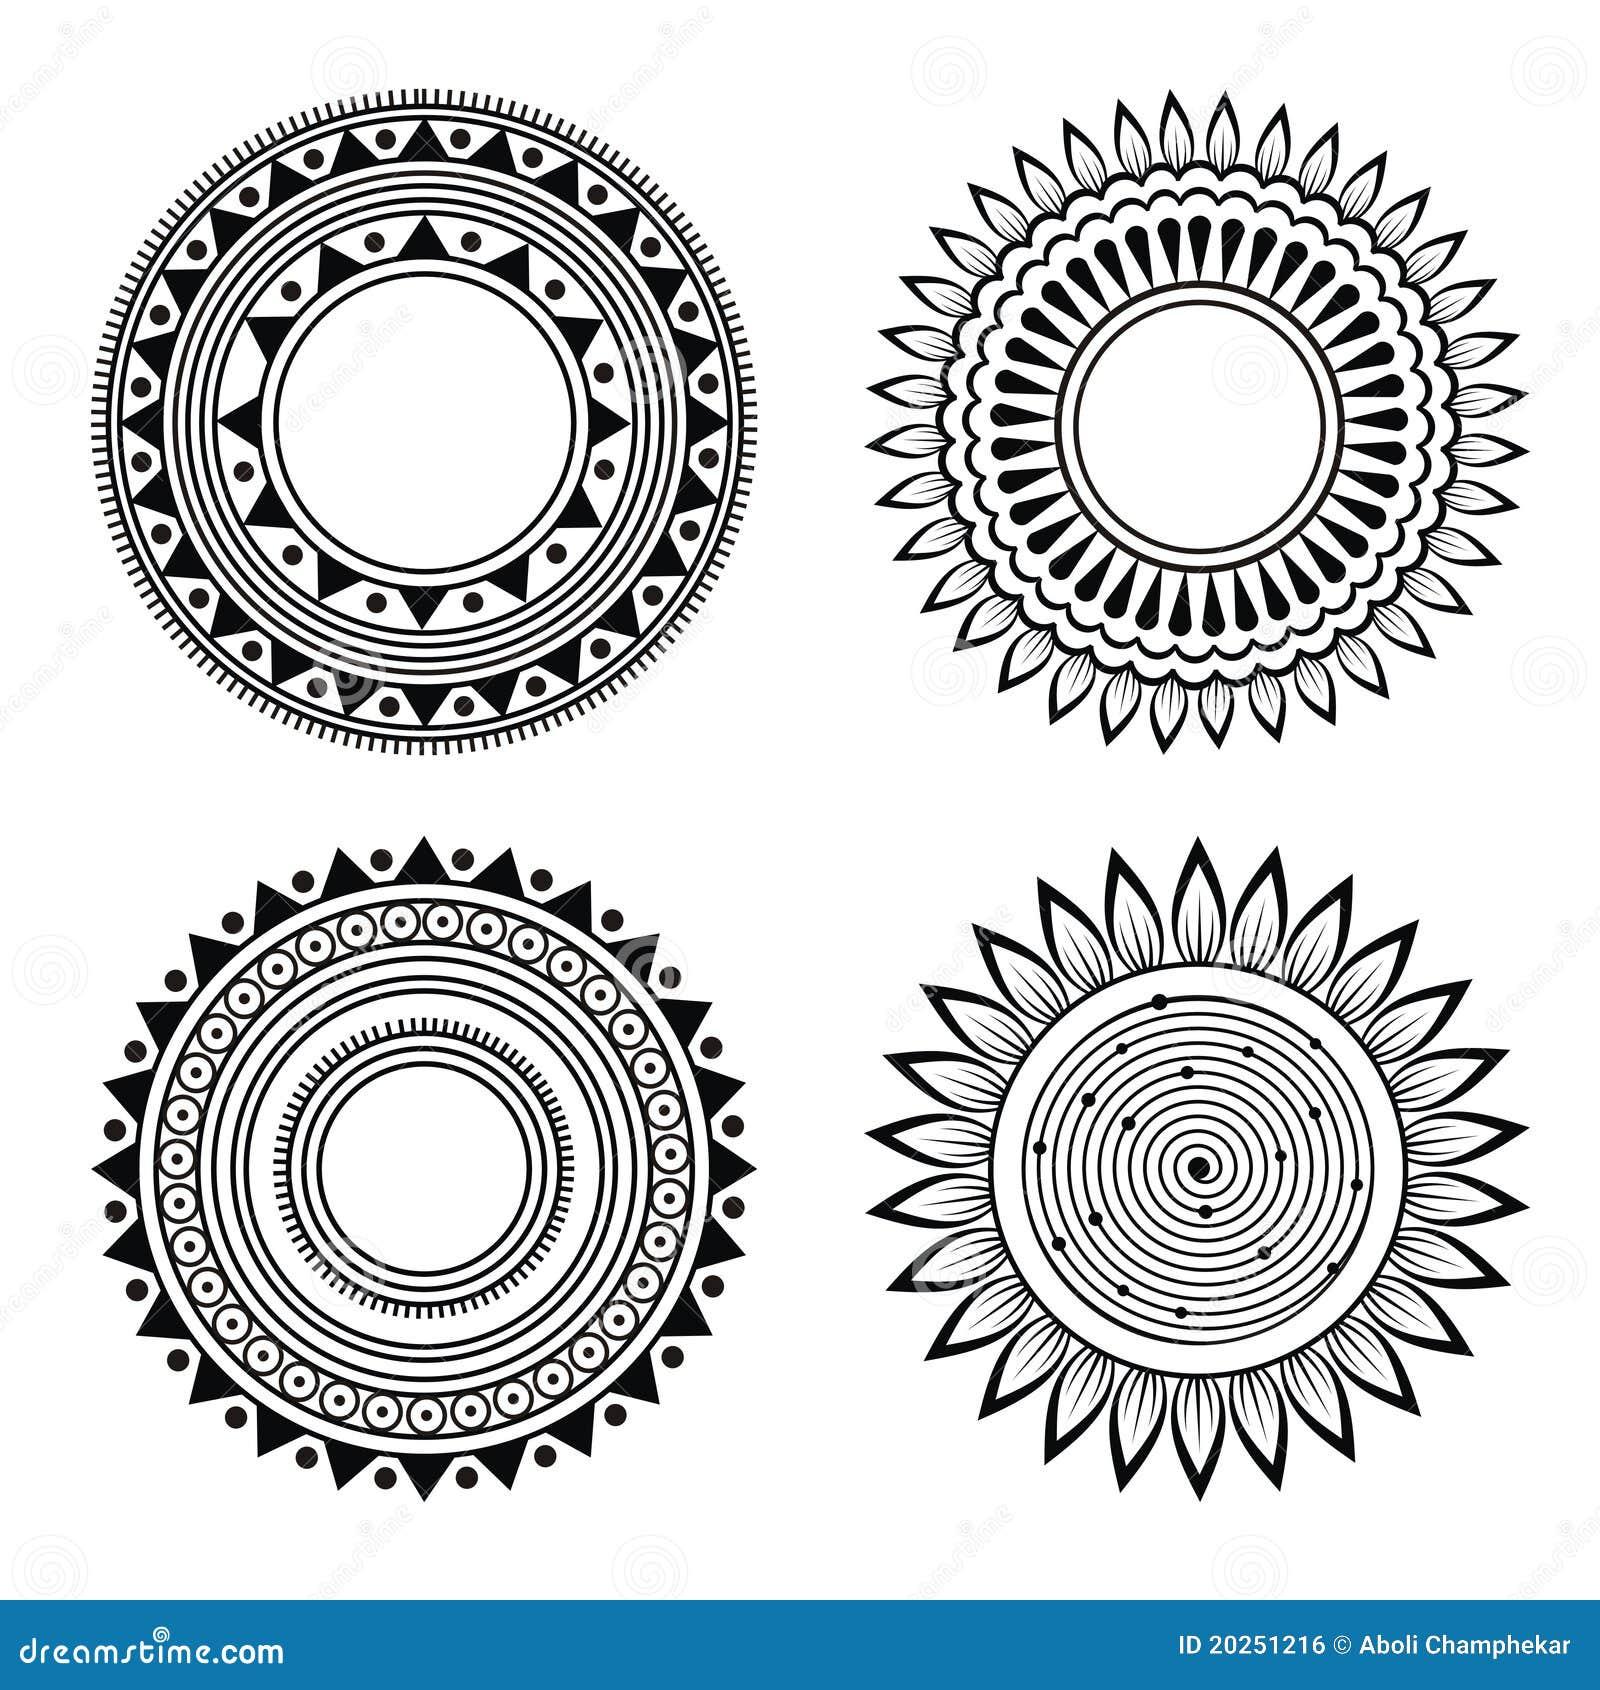 Black And White Symmetric Henna Patterns Stock Illustration